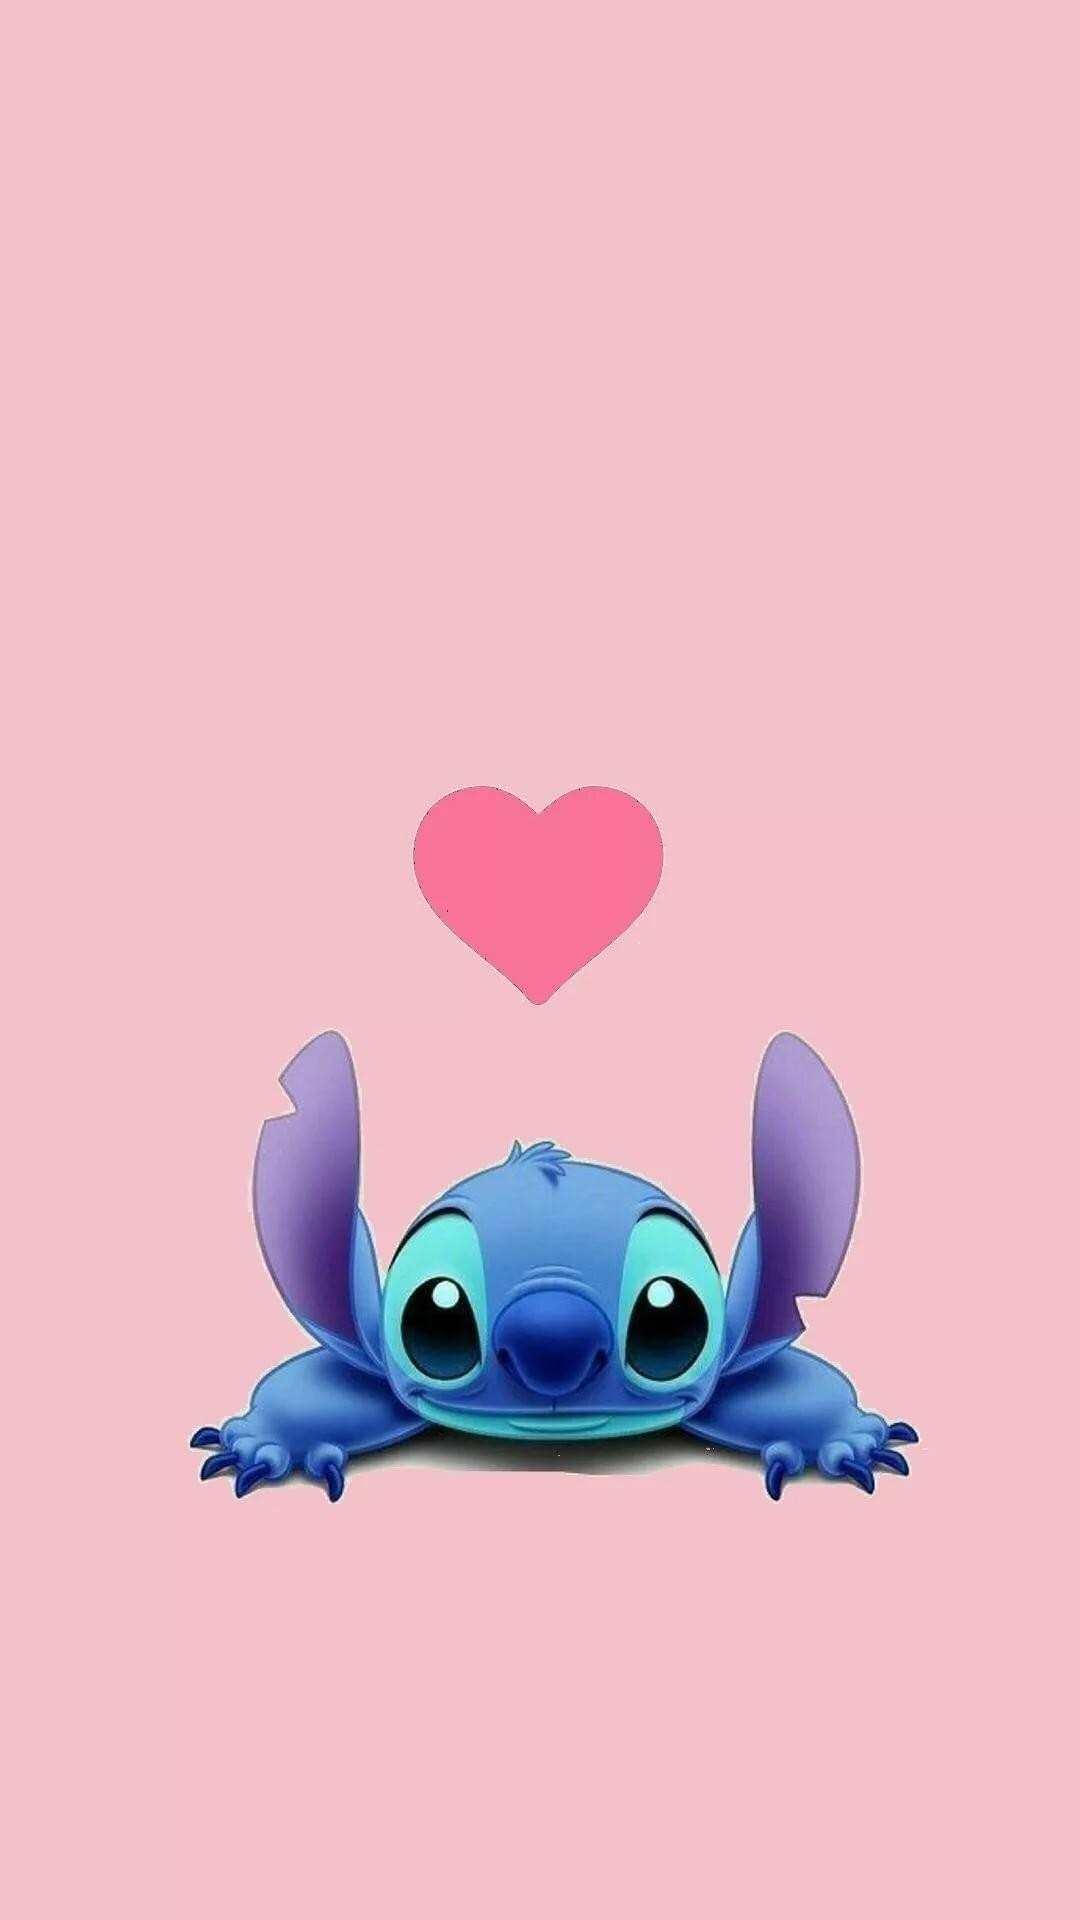 Disney phone background